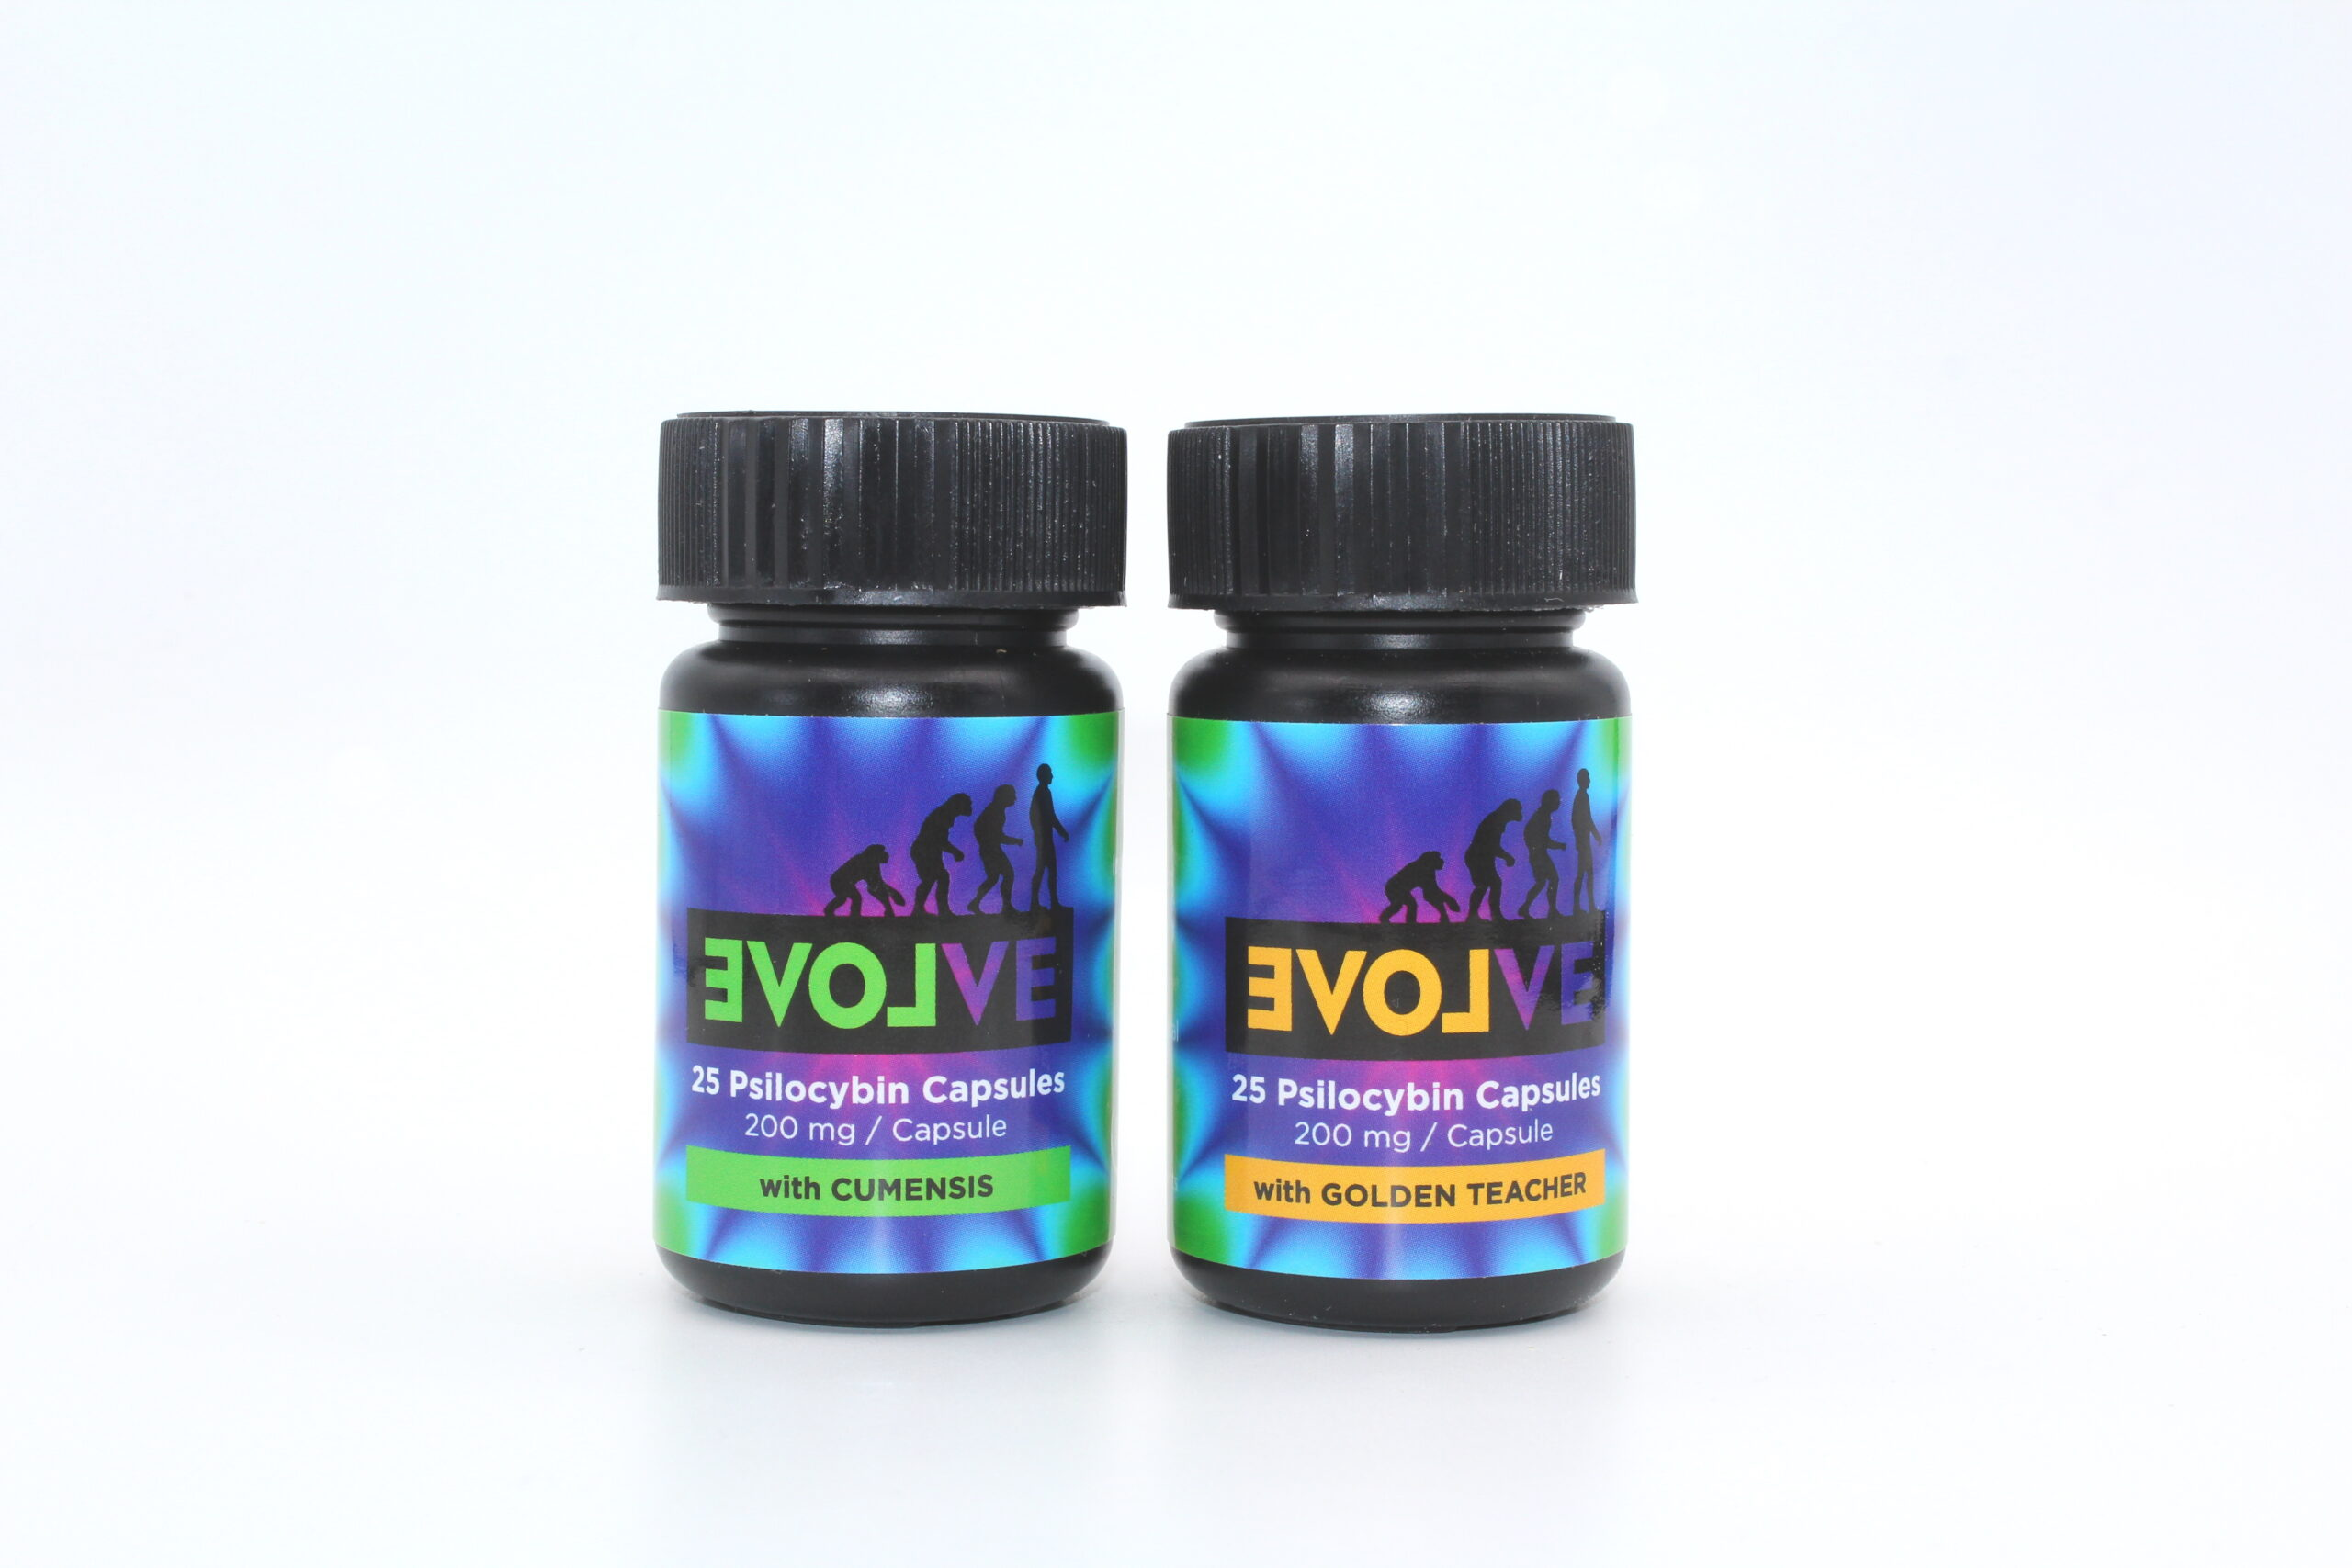 Evolve – 25 Psilocybin Capsules | 200mg